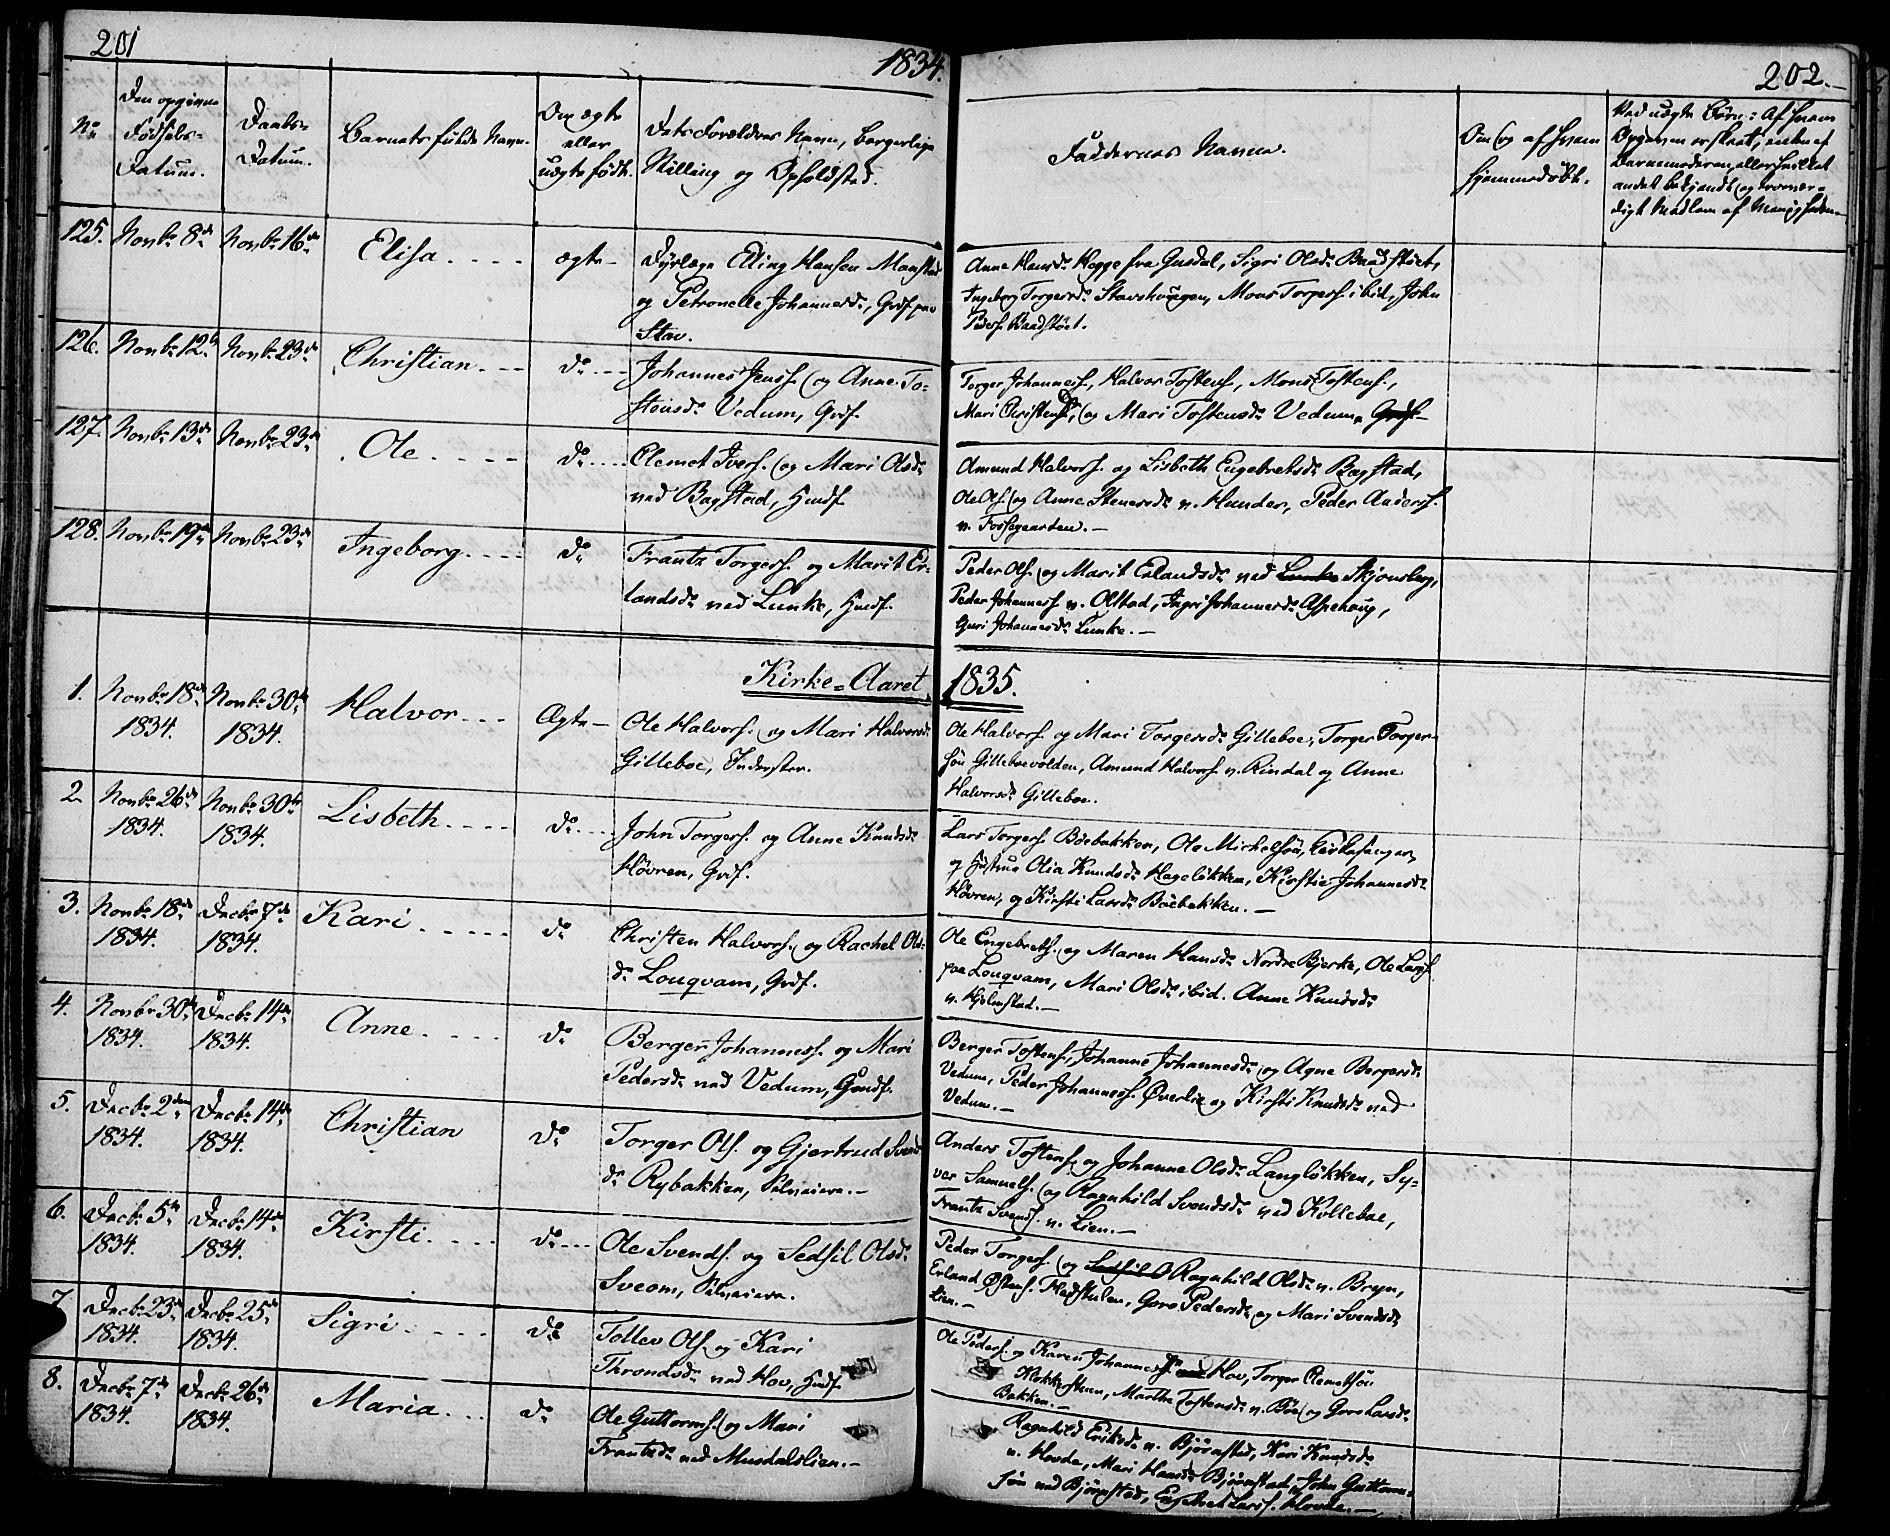 SAH, Øyer prestekontor, Ministerialbok nr. 4, 1824-1841, s. 201-202